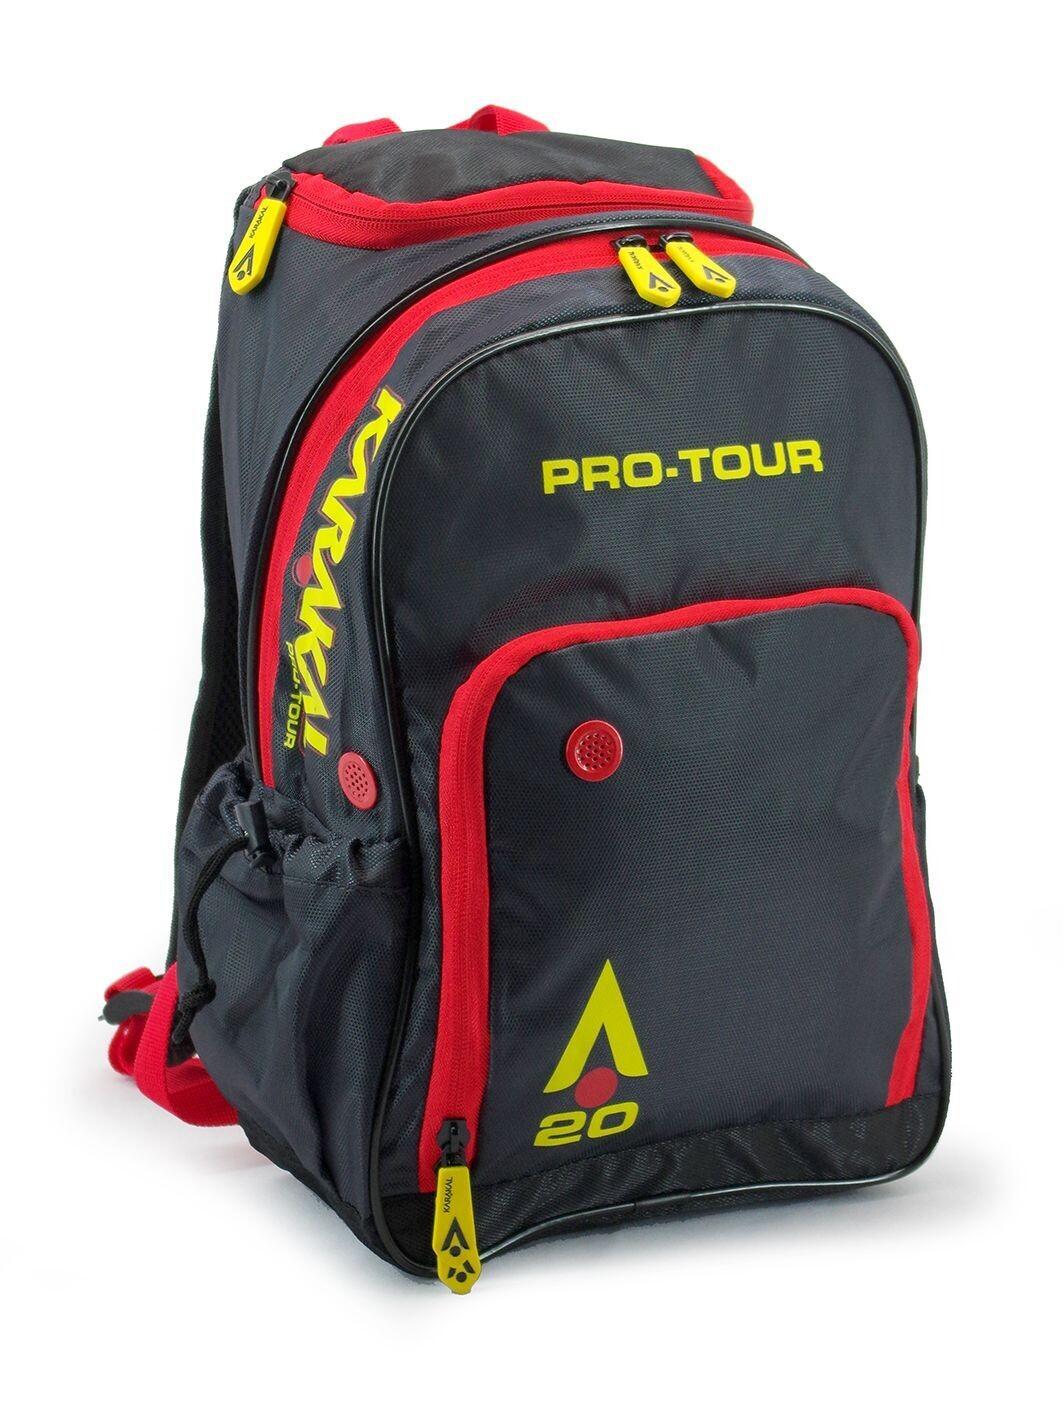 Karakal Pro Tour 20 Backpack - Black